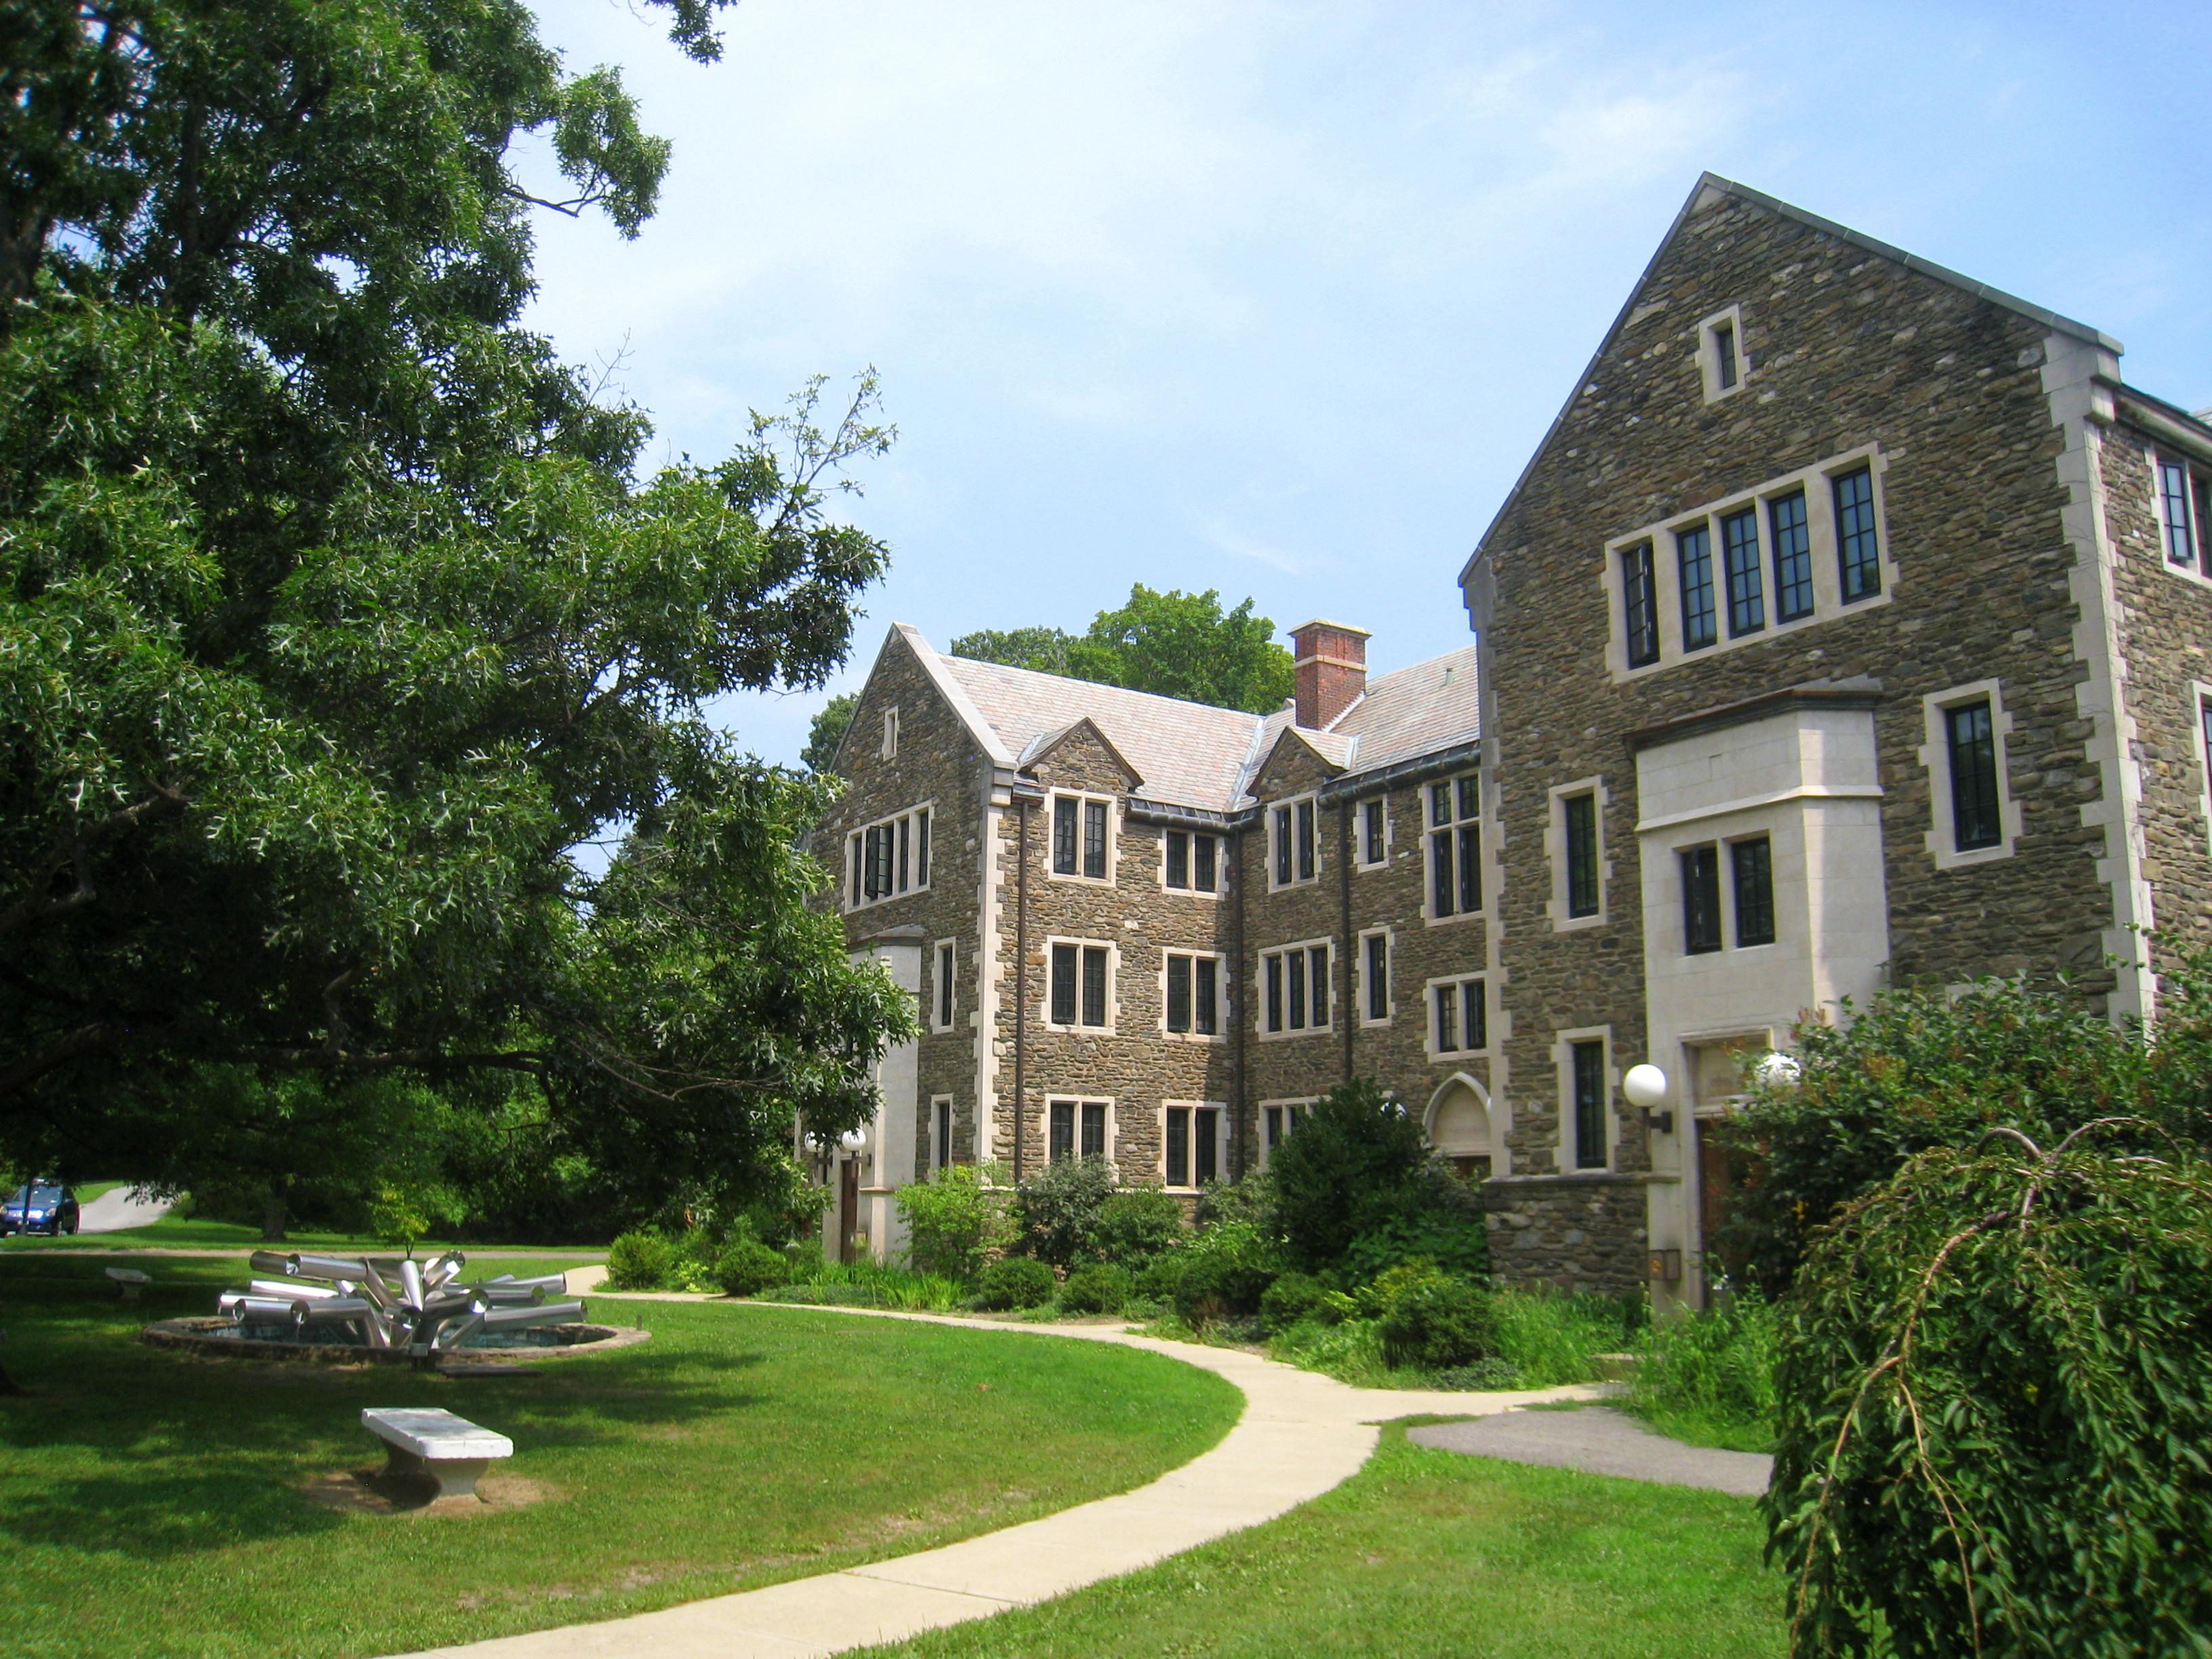 Bard College - IMG 7995.JPG